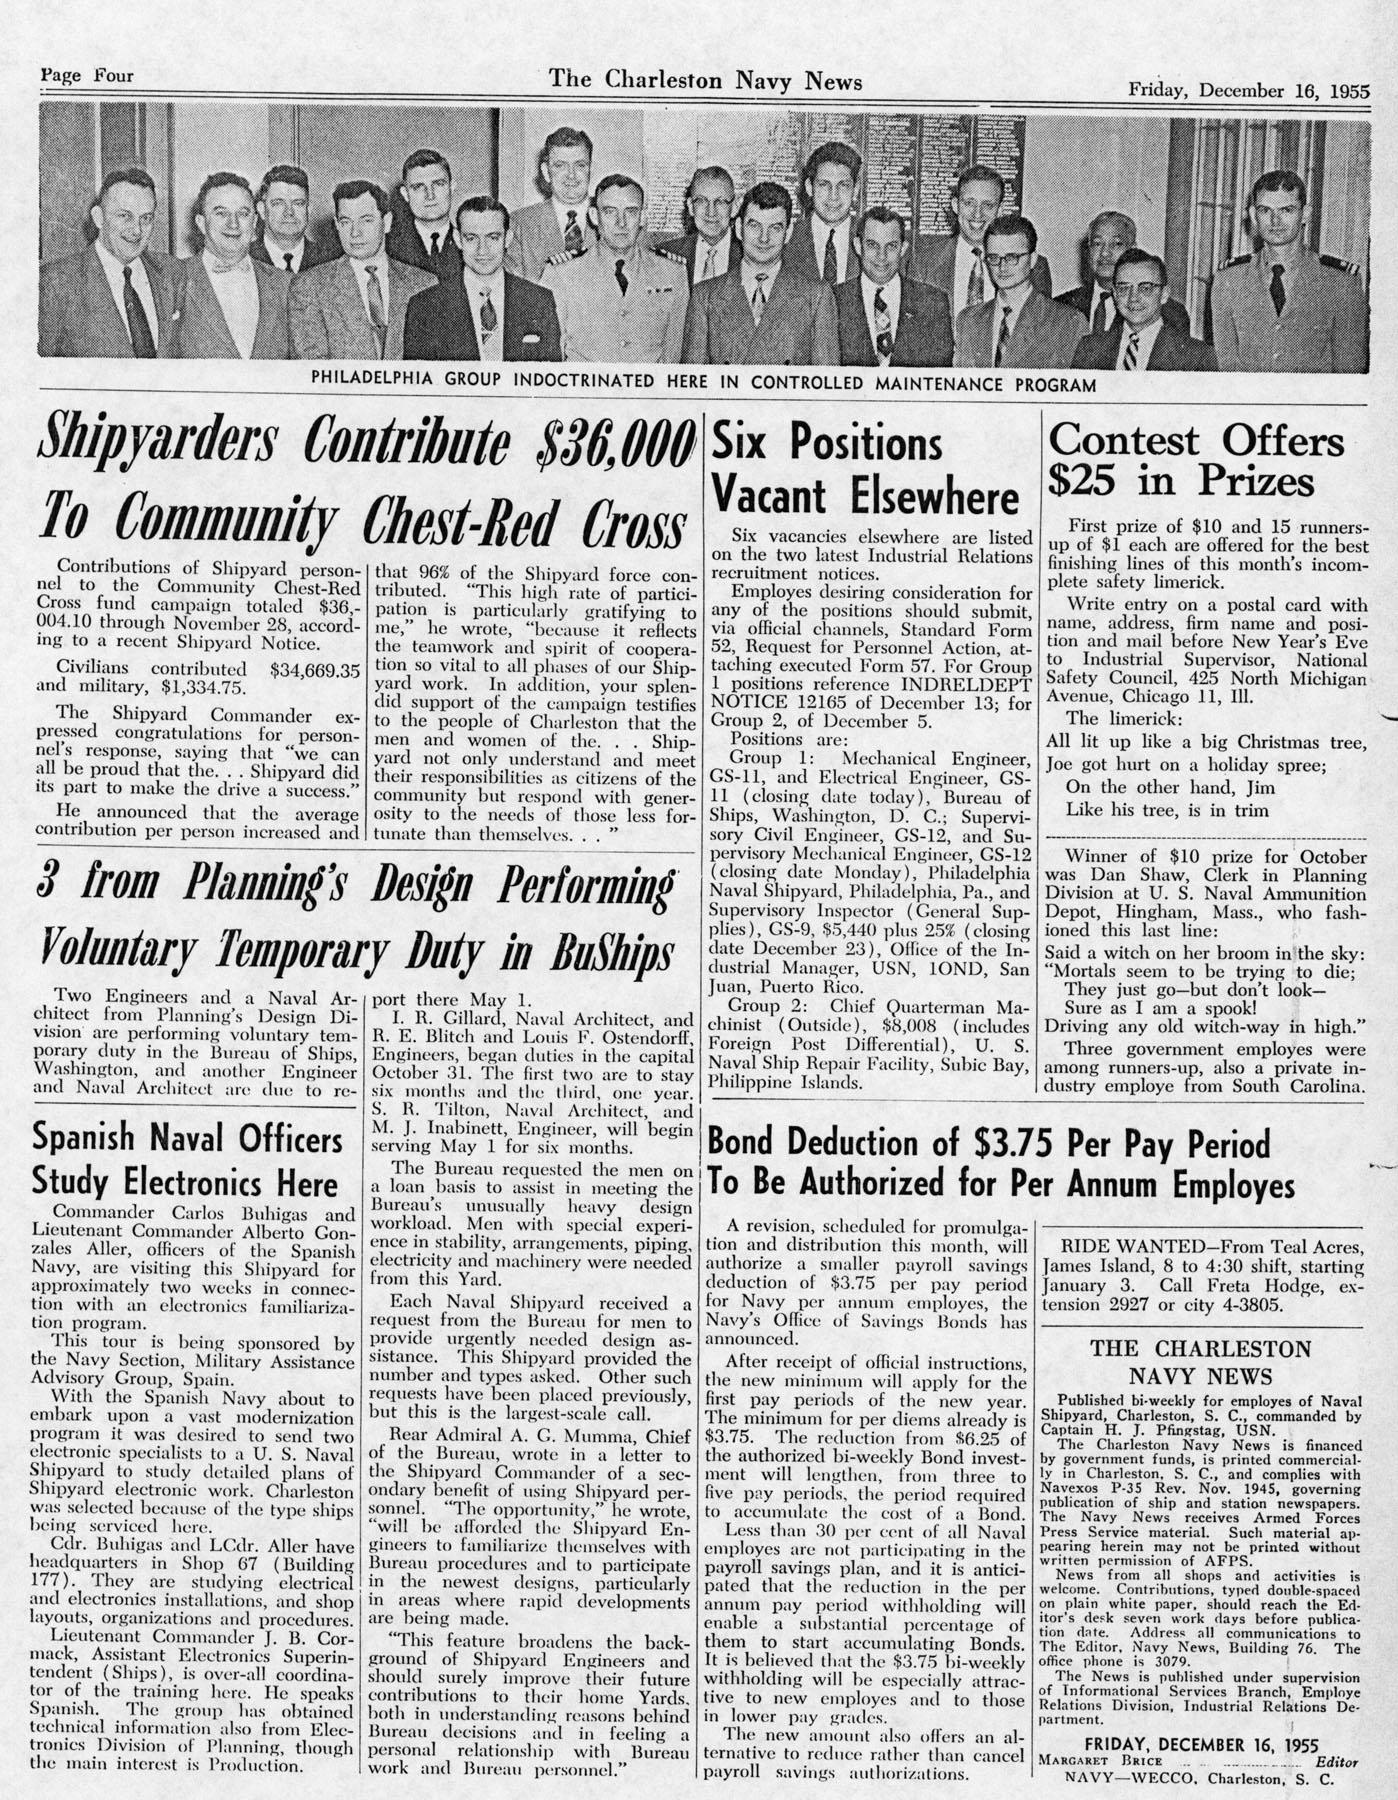 The Charleston Navy News, Volume 14, Edition 11, page iv